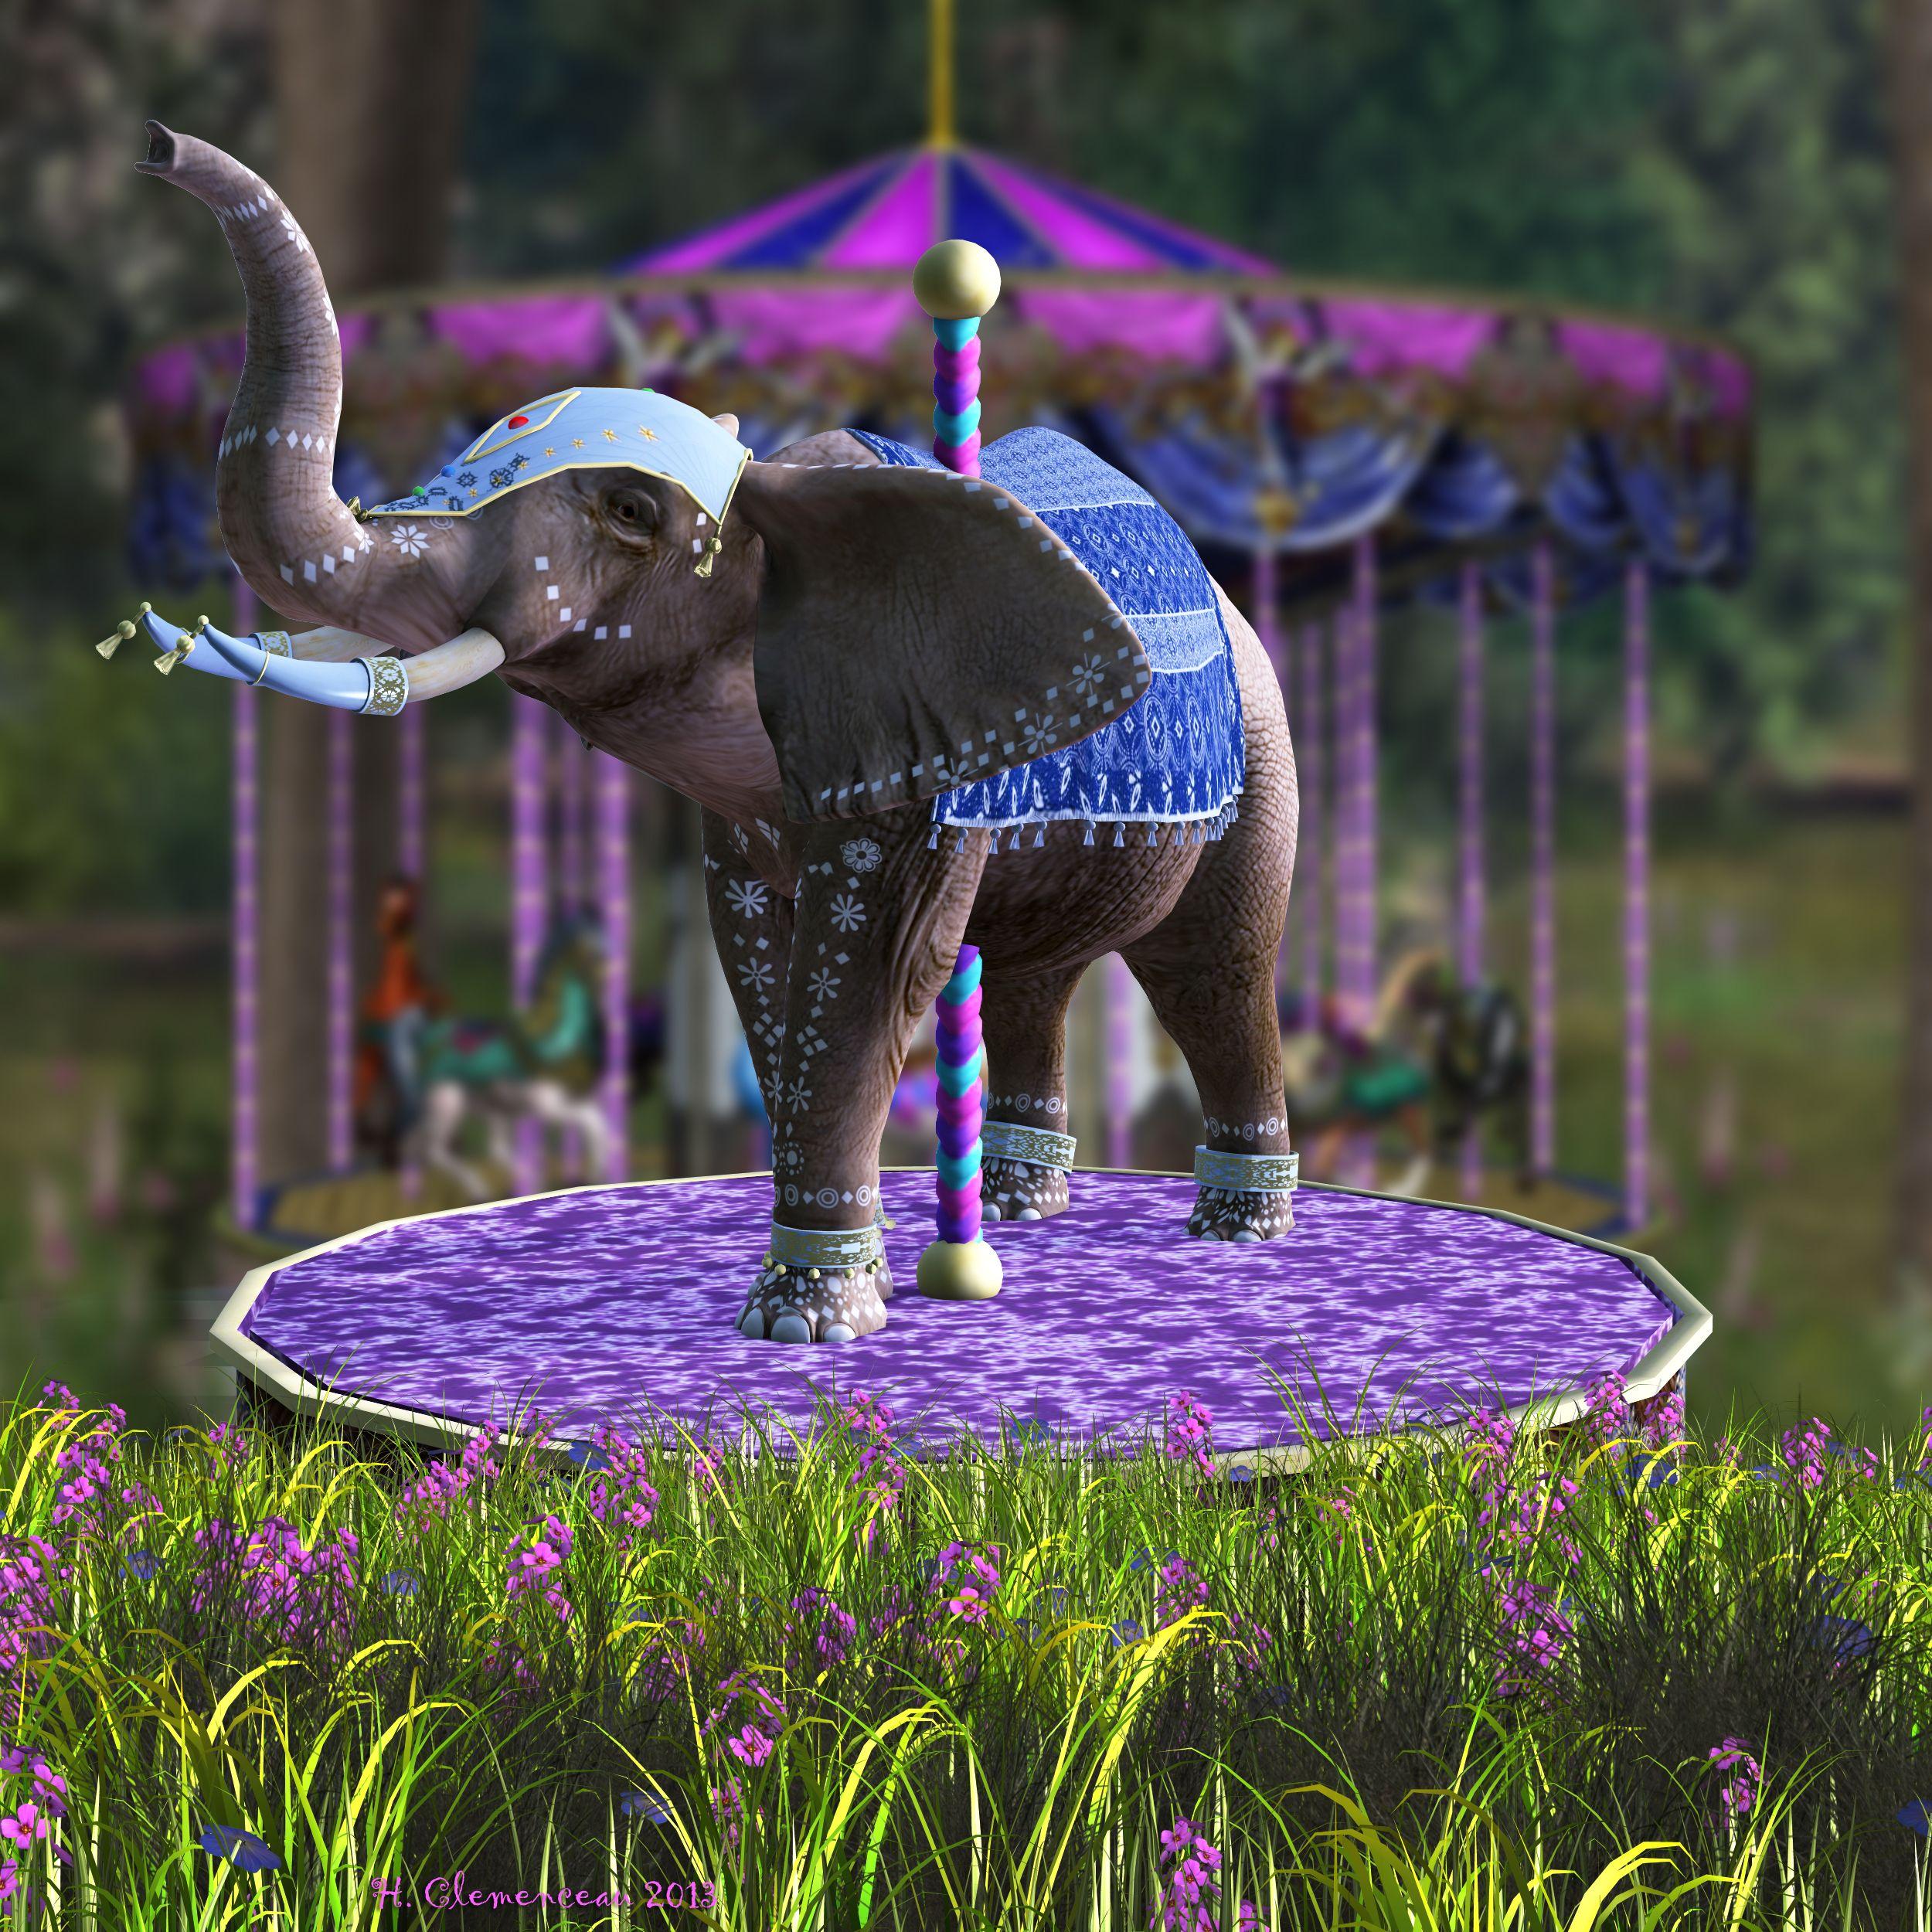 http://heatherclemenceau.files.wordpress.com/2013/11/elephant-carousel.jpg